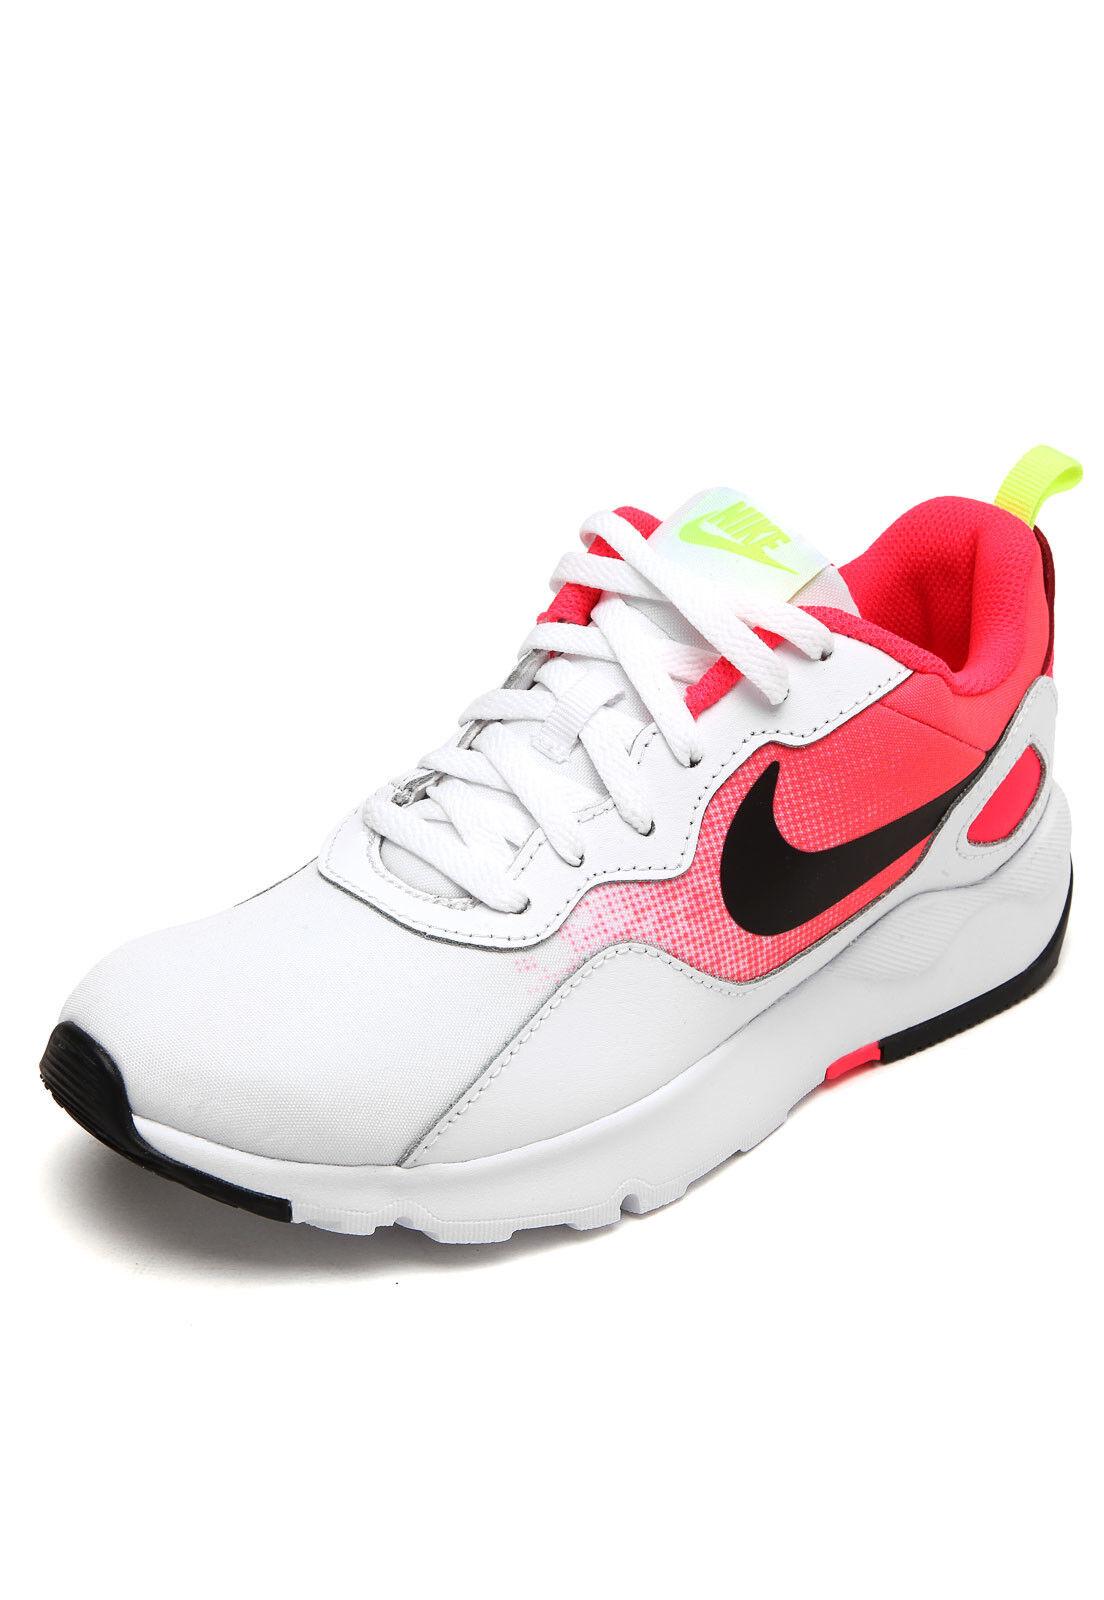 nike nike nike sportswear tennis ld runner chaussures femmes blanc / taille 10 nouveaux 882267-103 rose 32c923